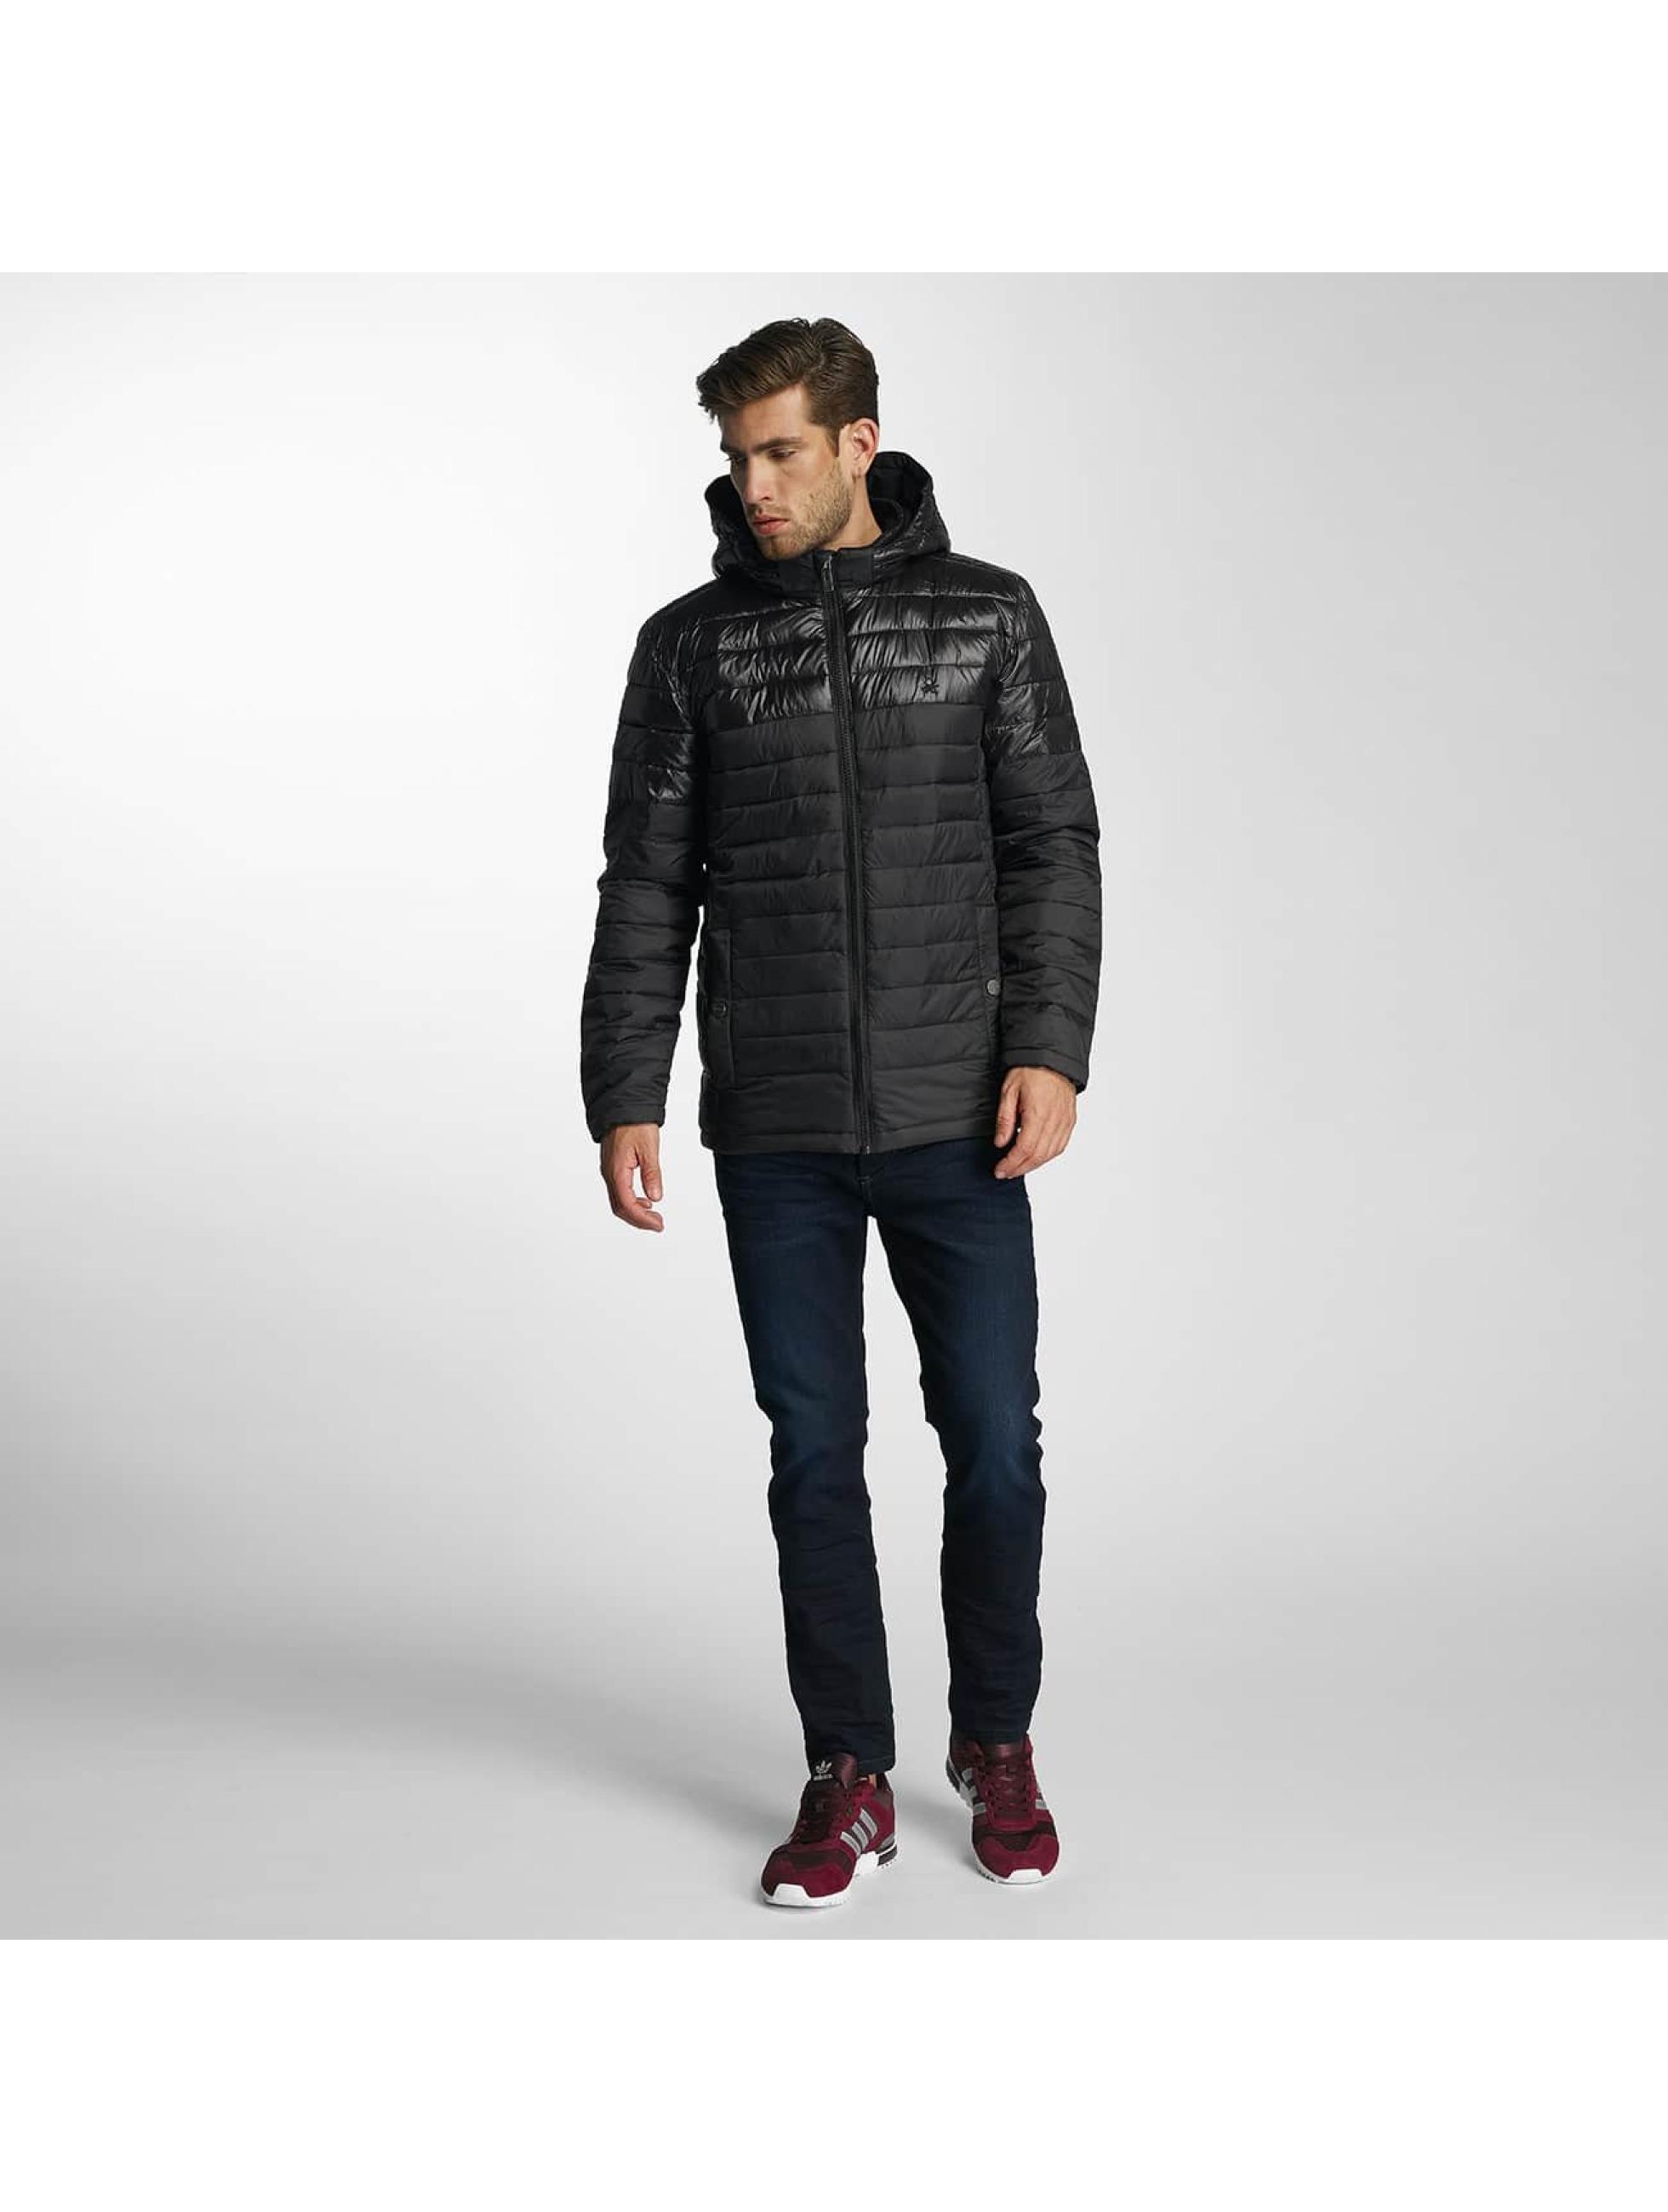 Paris Premium Vinterjakke Puffy svart